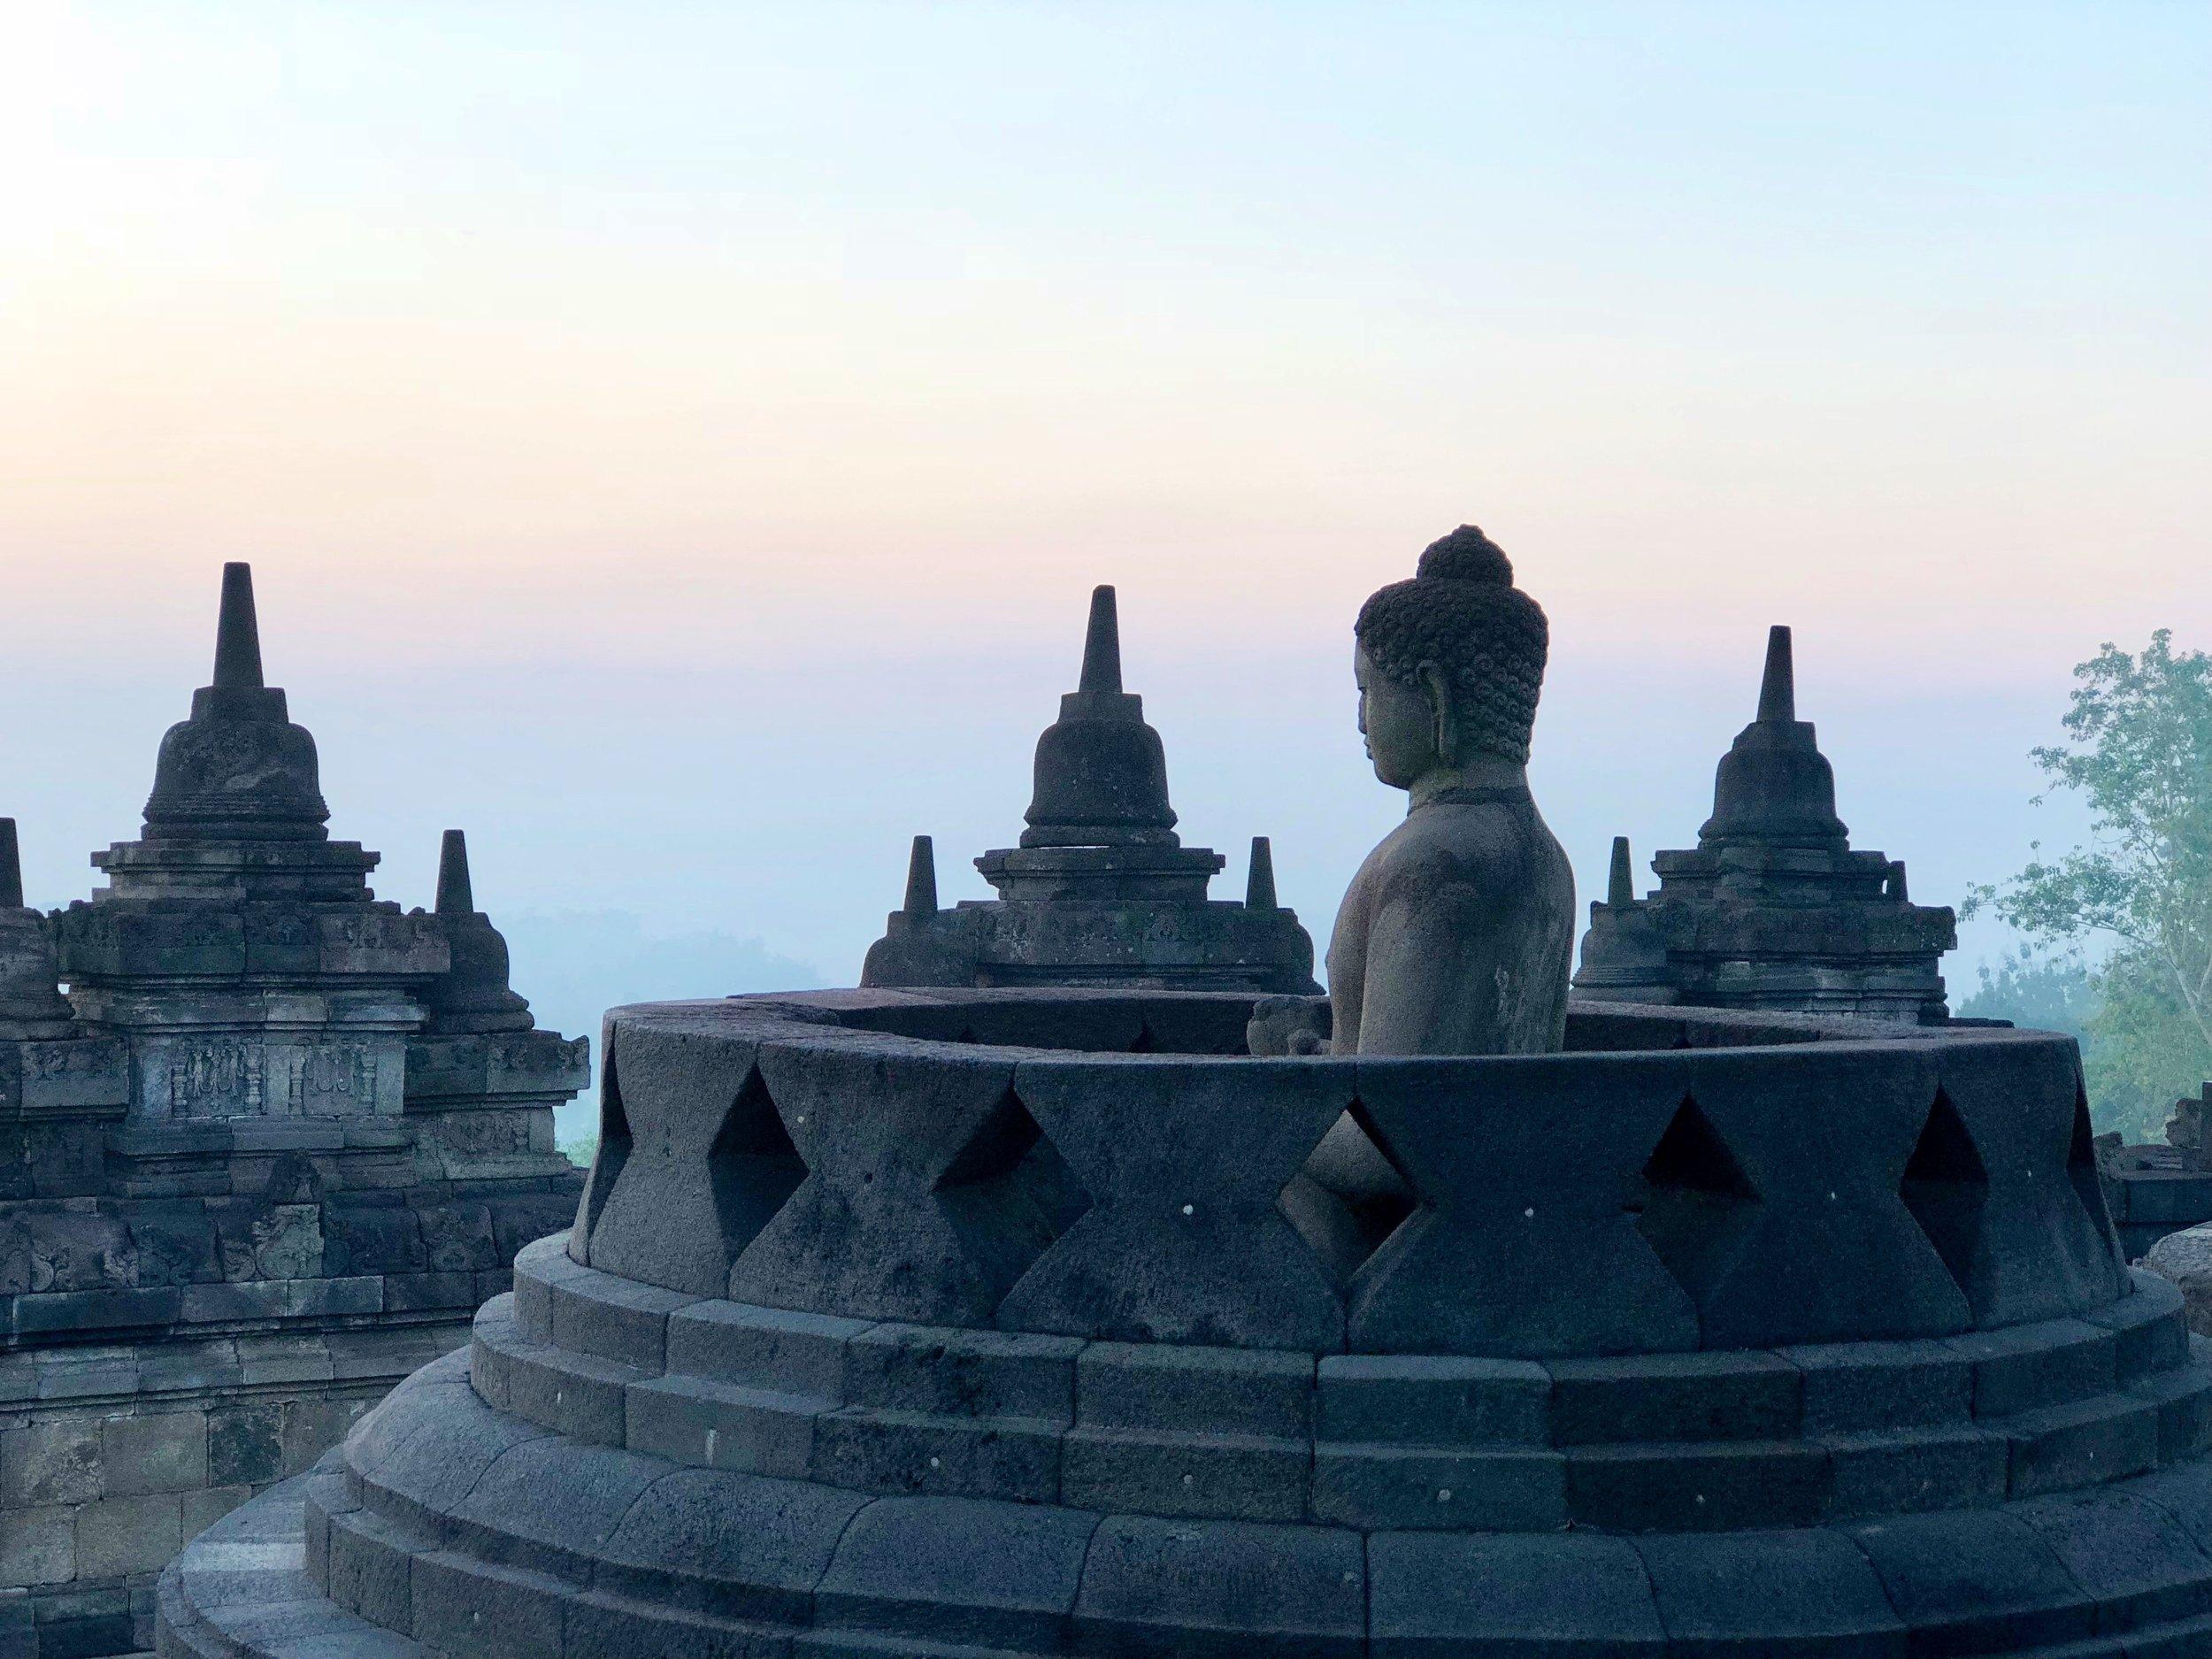 Underneath each stupa hides a seated Buddha statue